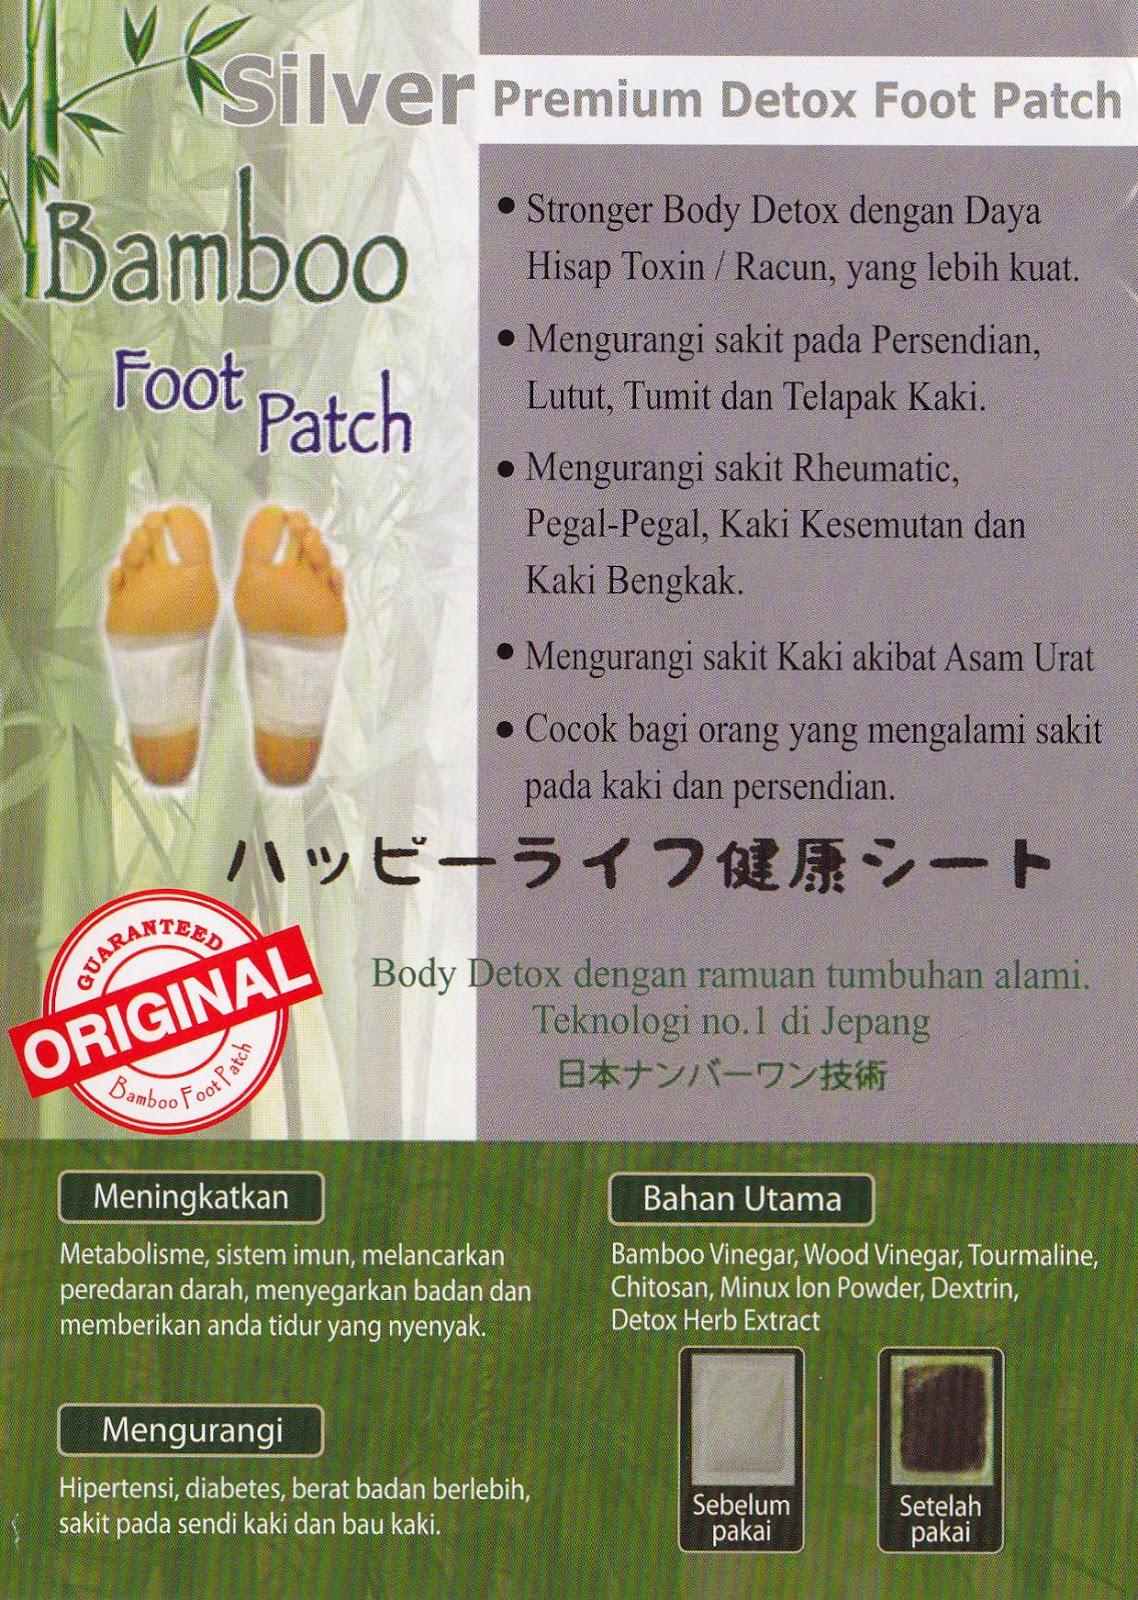 Jual Murah Koyo Kaki Bamboo Original Terbaru 2018 Gold Penyerap Racun Tubuh Silver